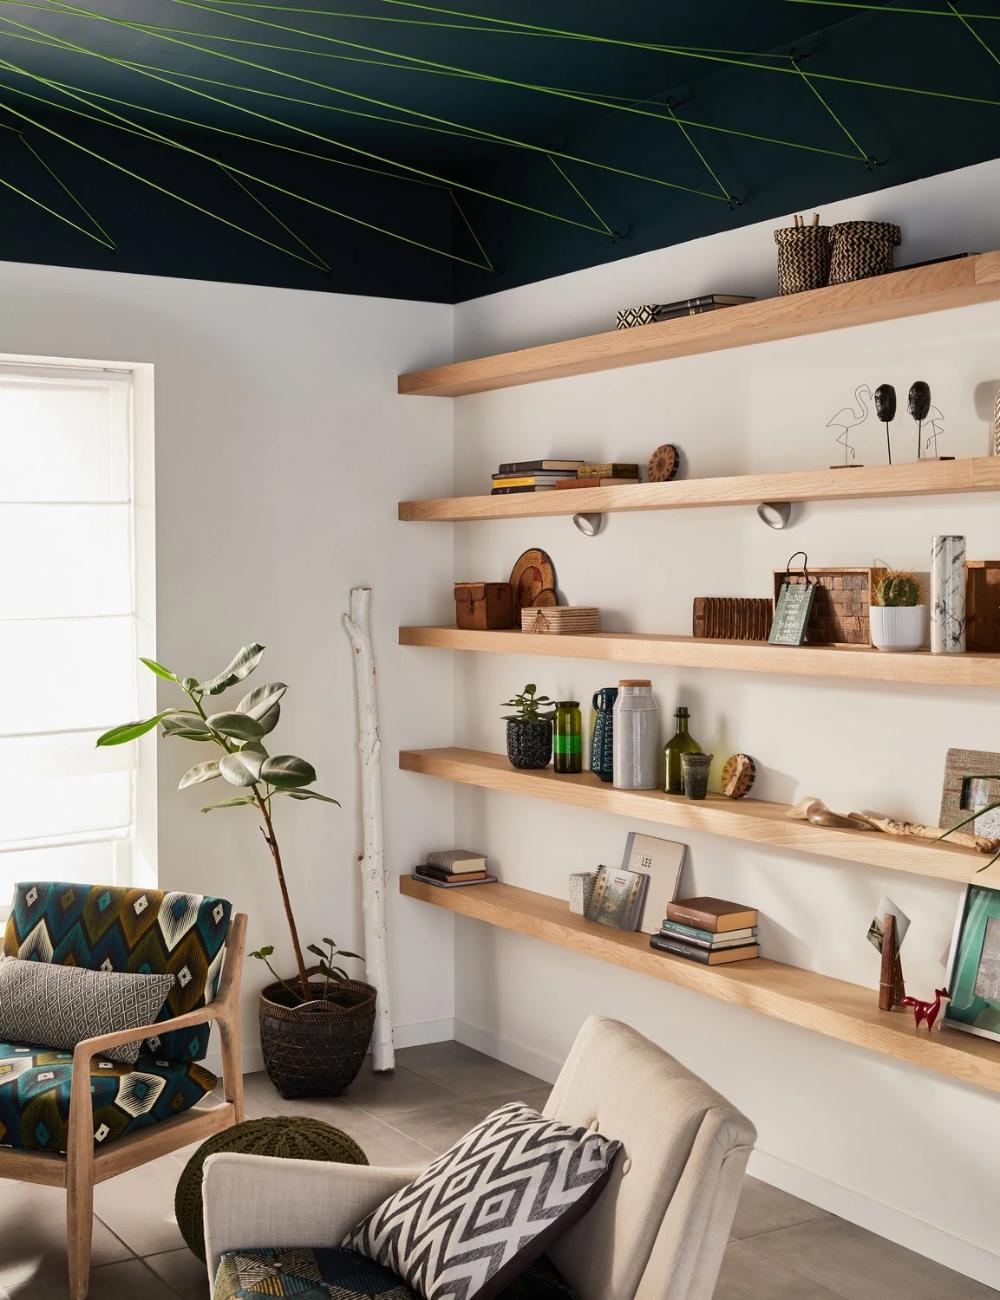 100 Fantastique Suggestions Idee Deco Salon Etagere